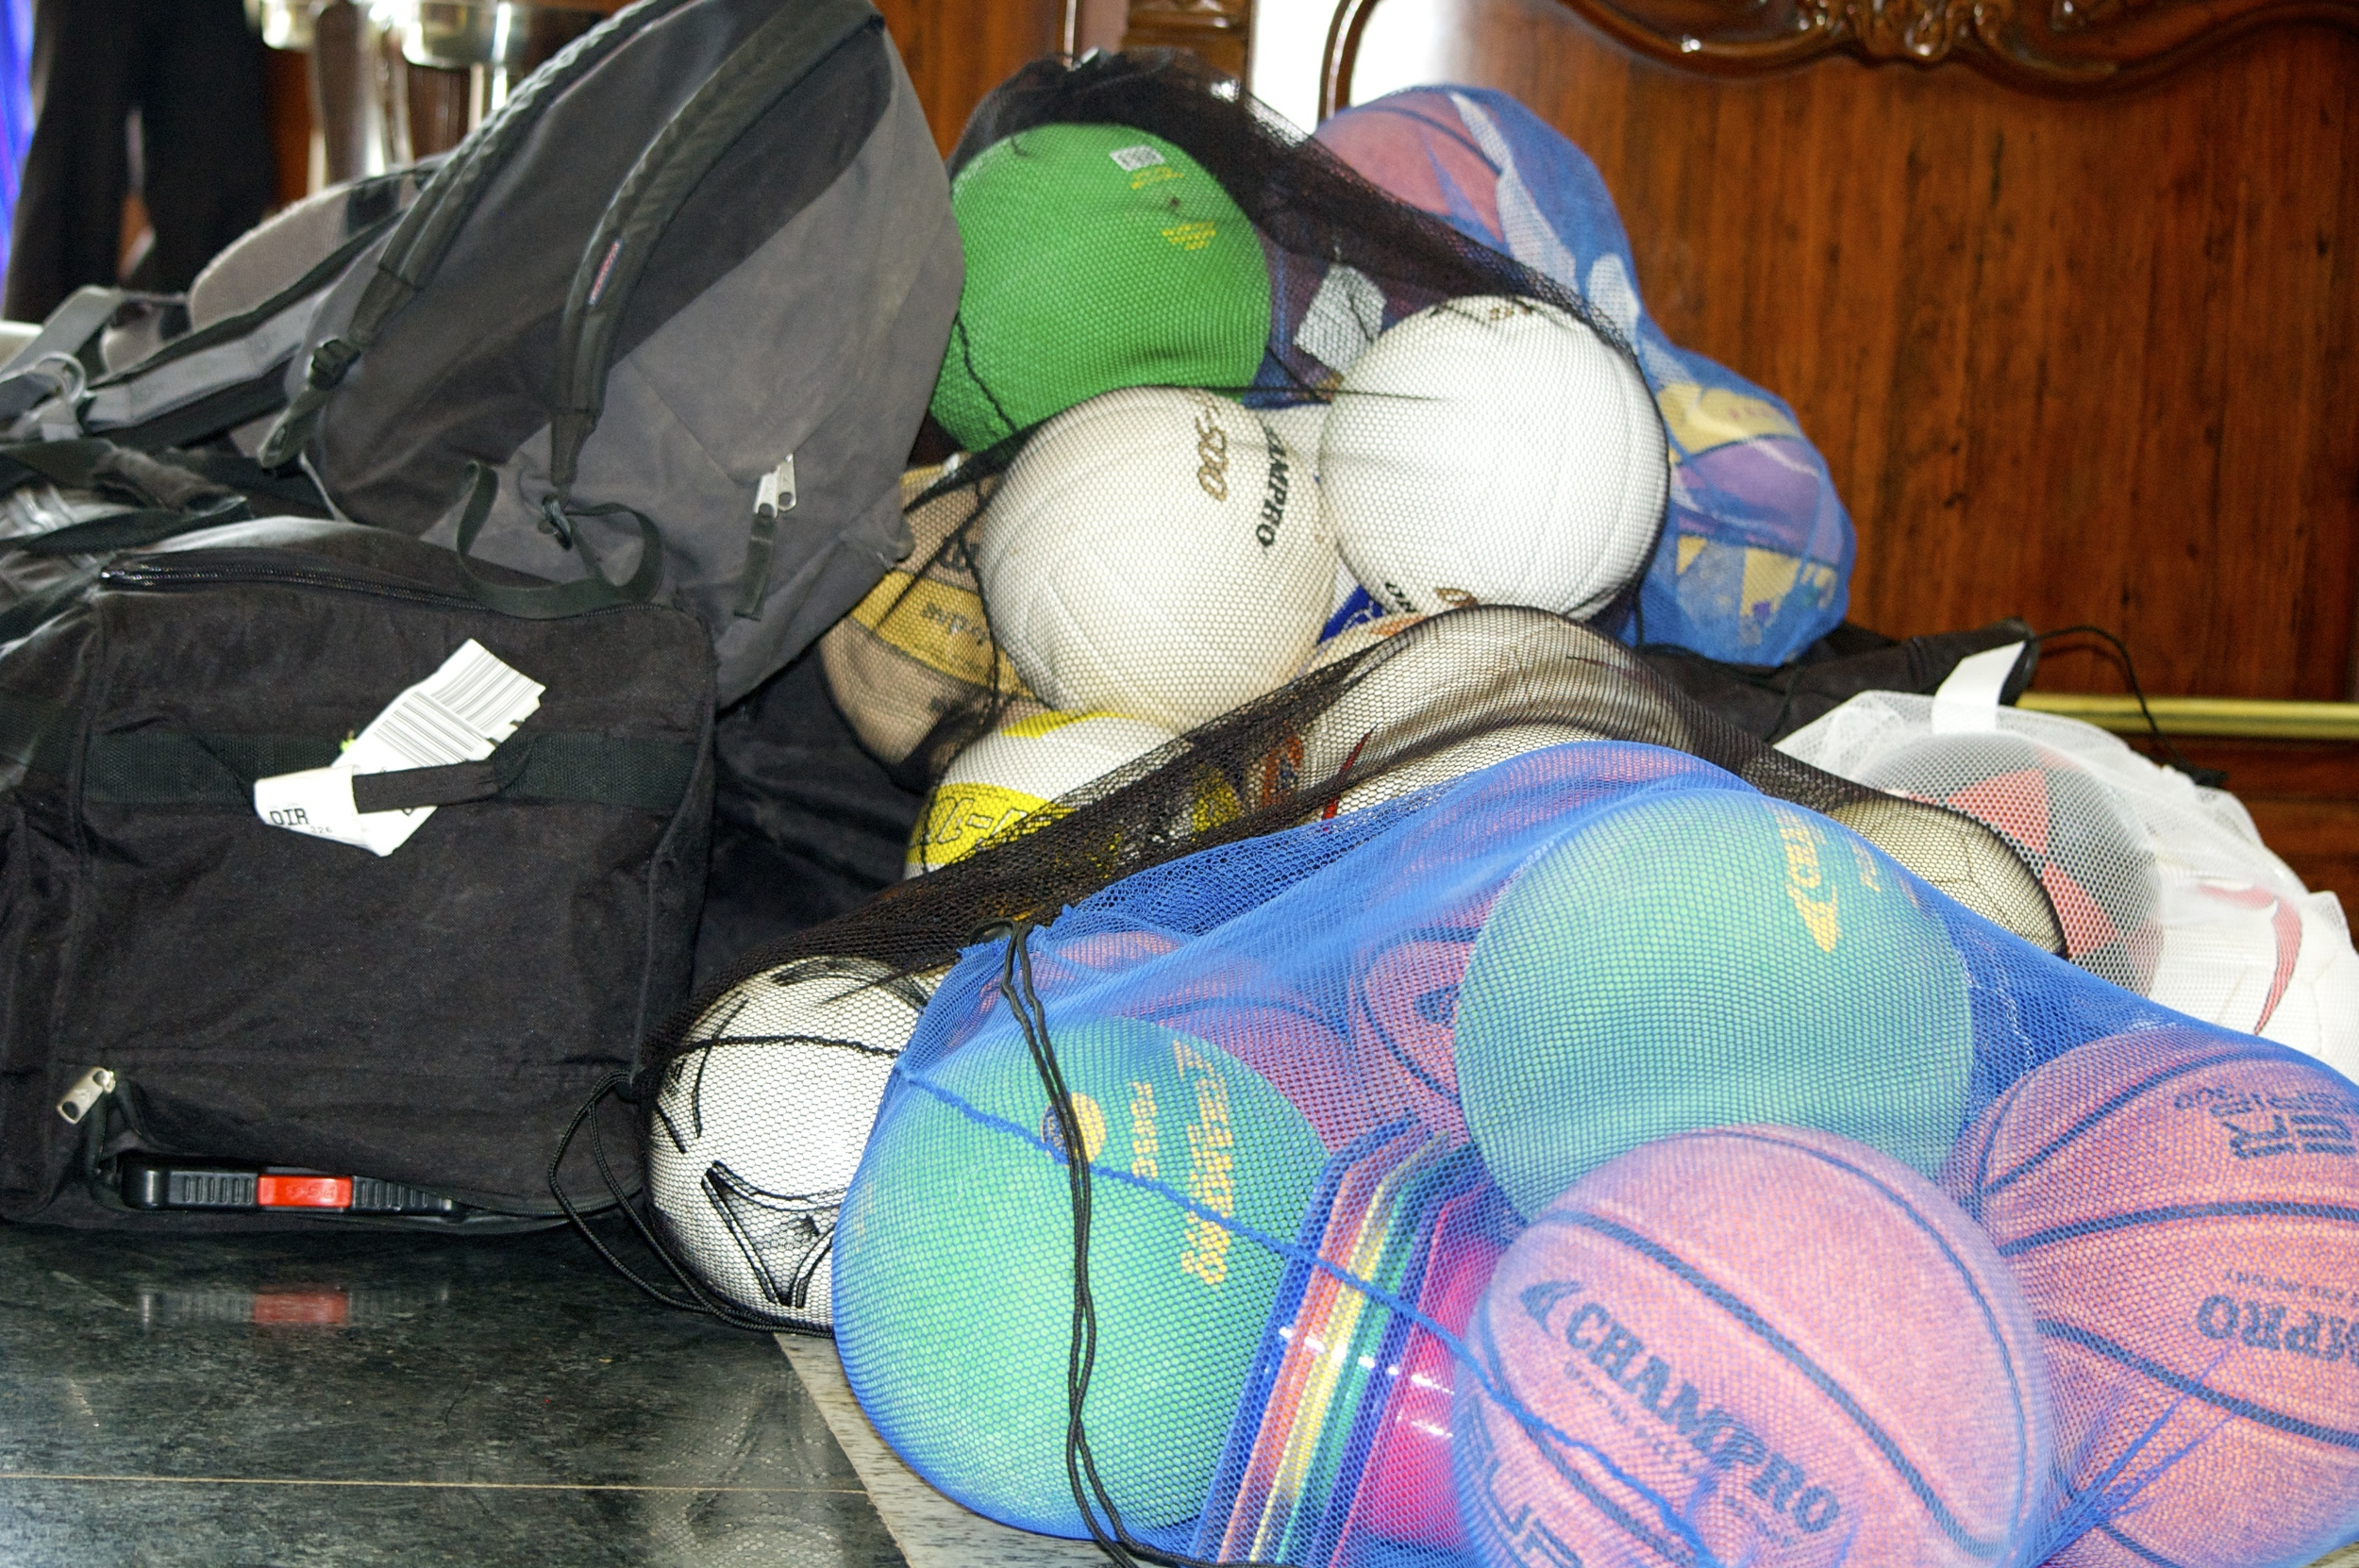 Bag of cones, balls for the school